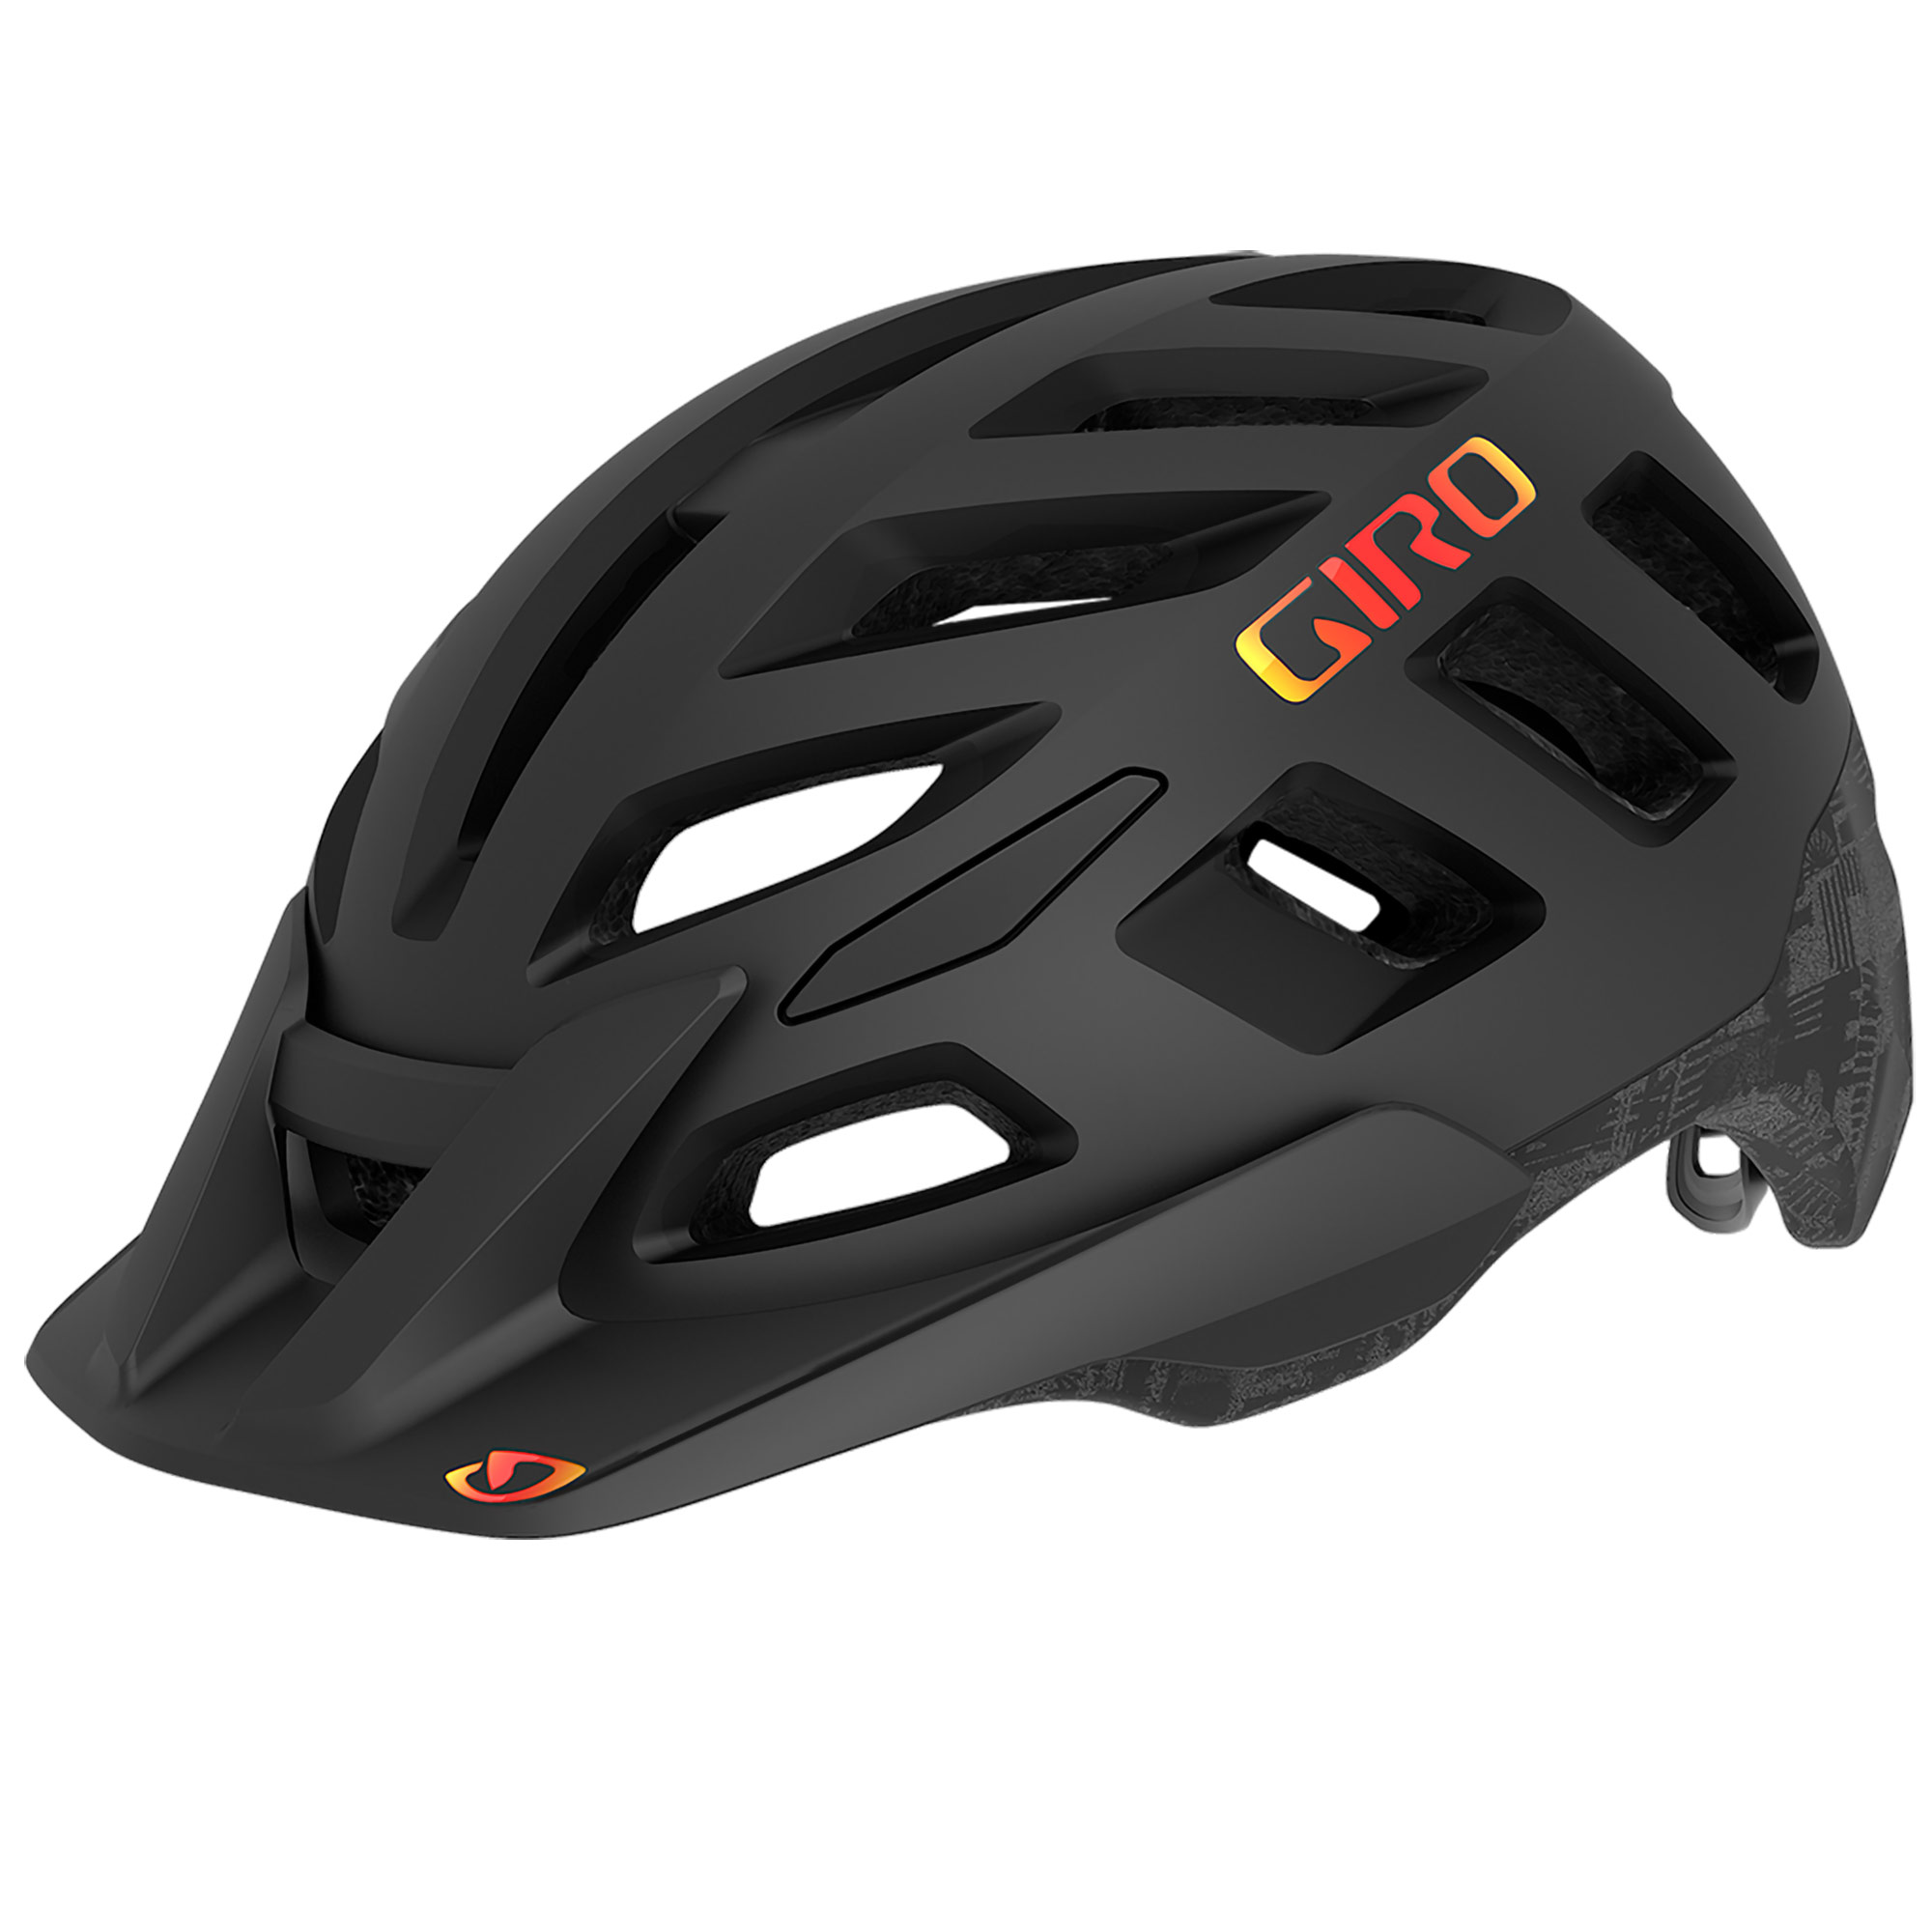 Off Road Bike MTB Crash Helmet Protection Giro Radix Dirt